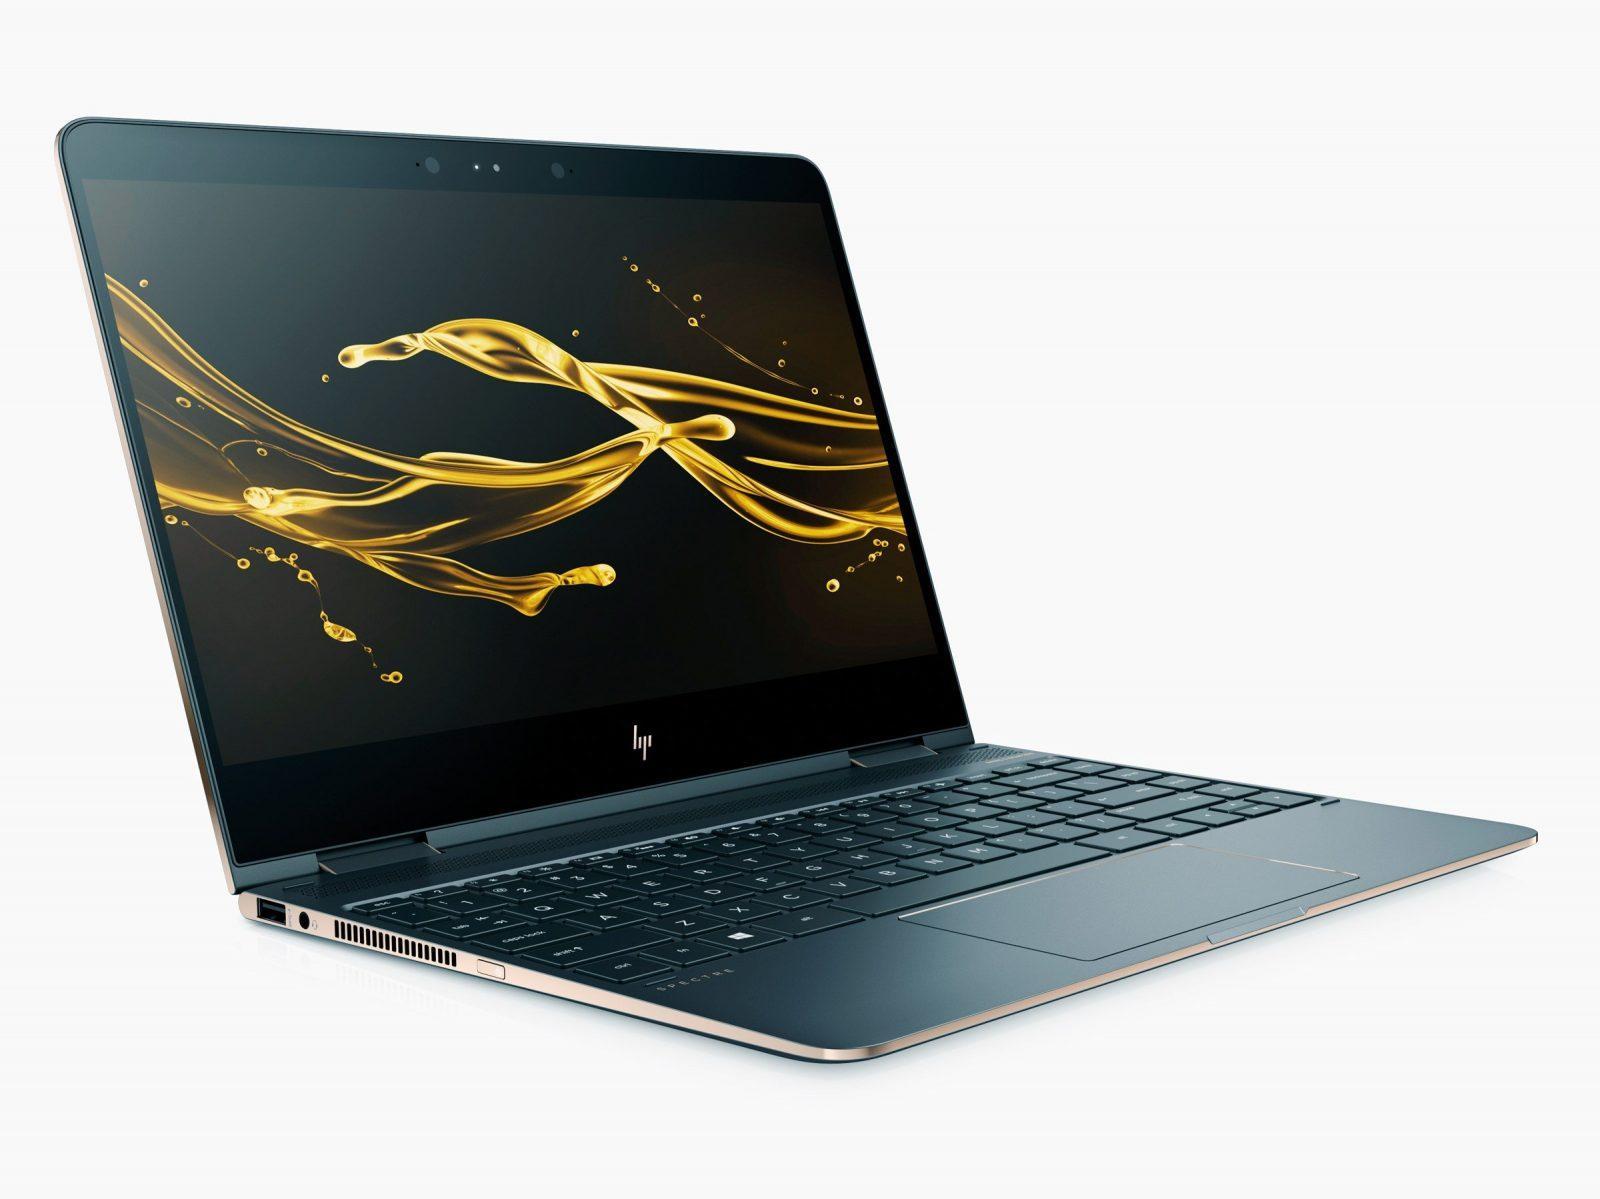 HP Spectre 13-ap0001ur x360